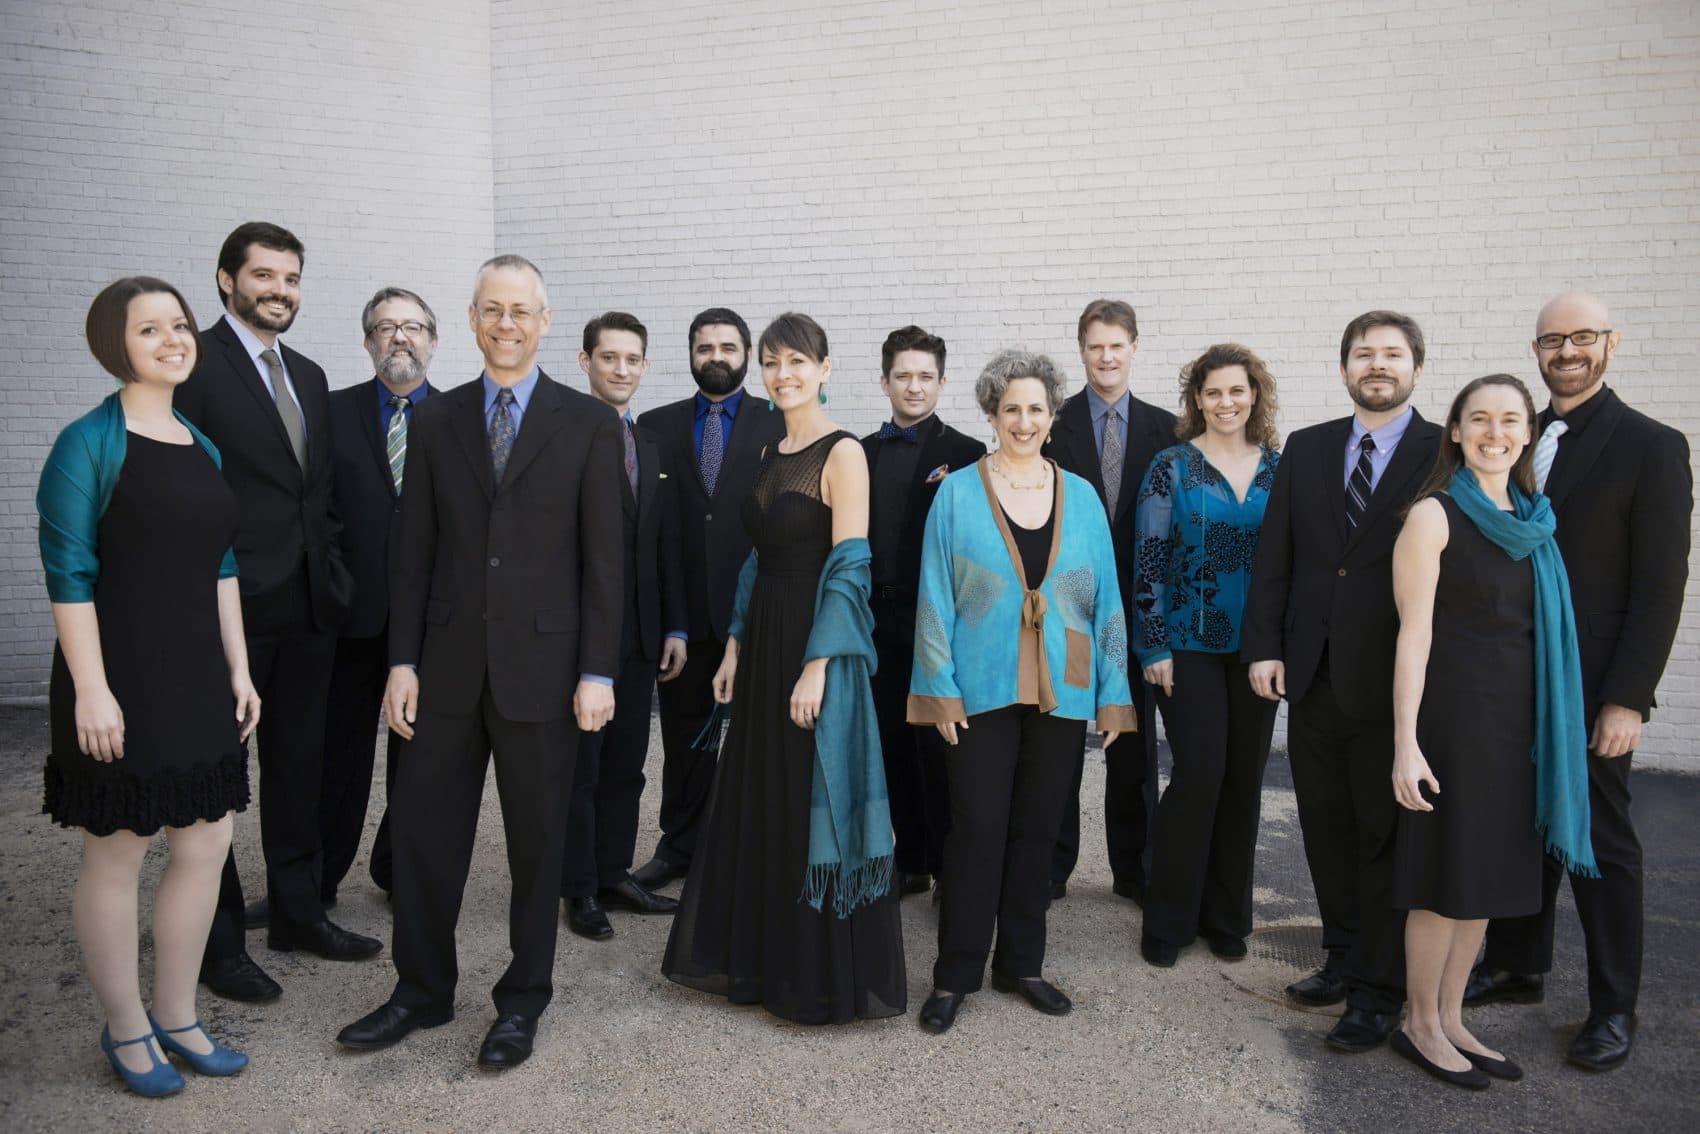 The Blue Heron ensemble. (Courtesy Liz Linder)